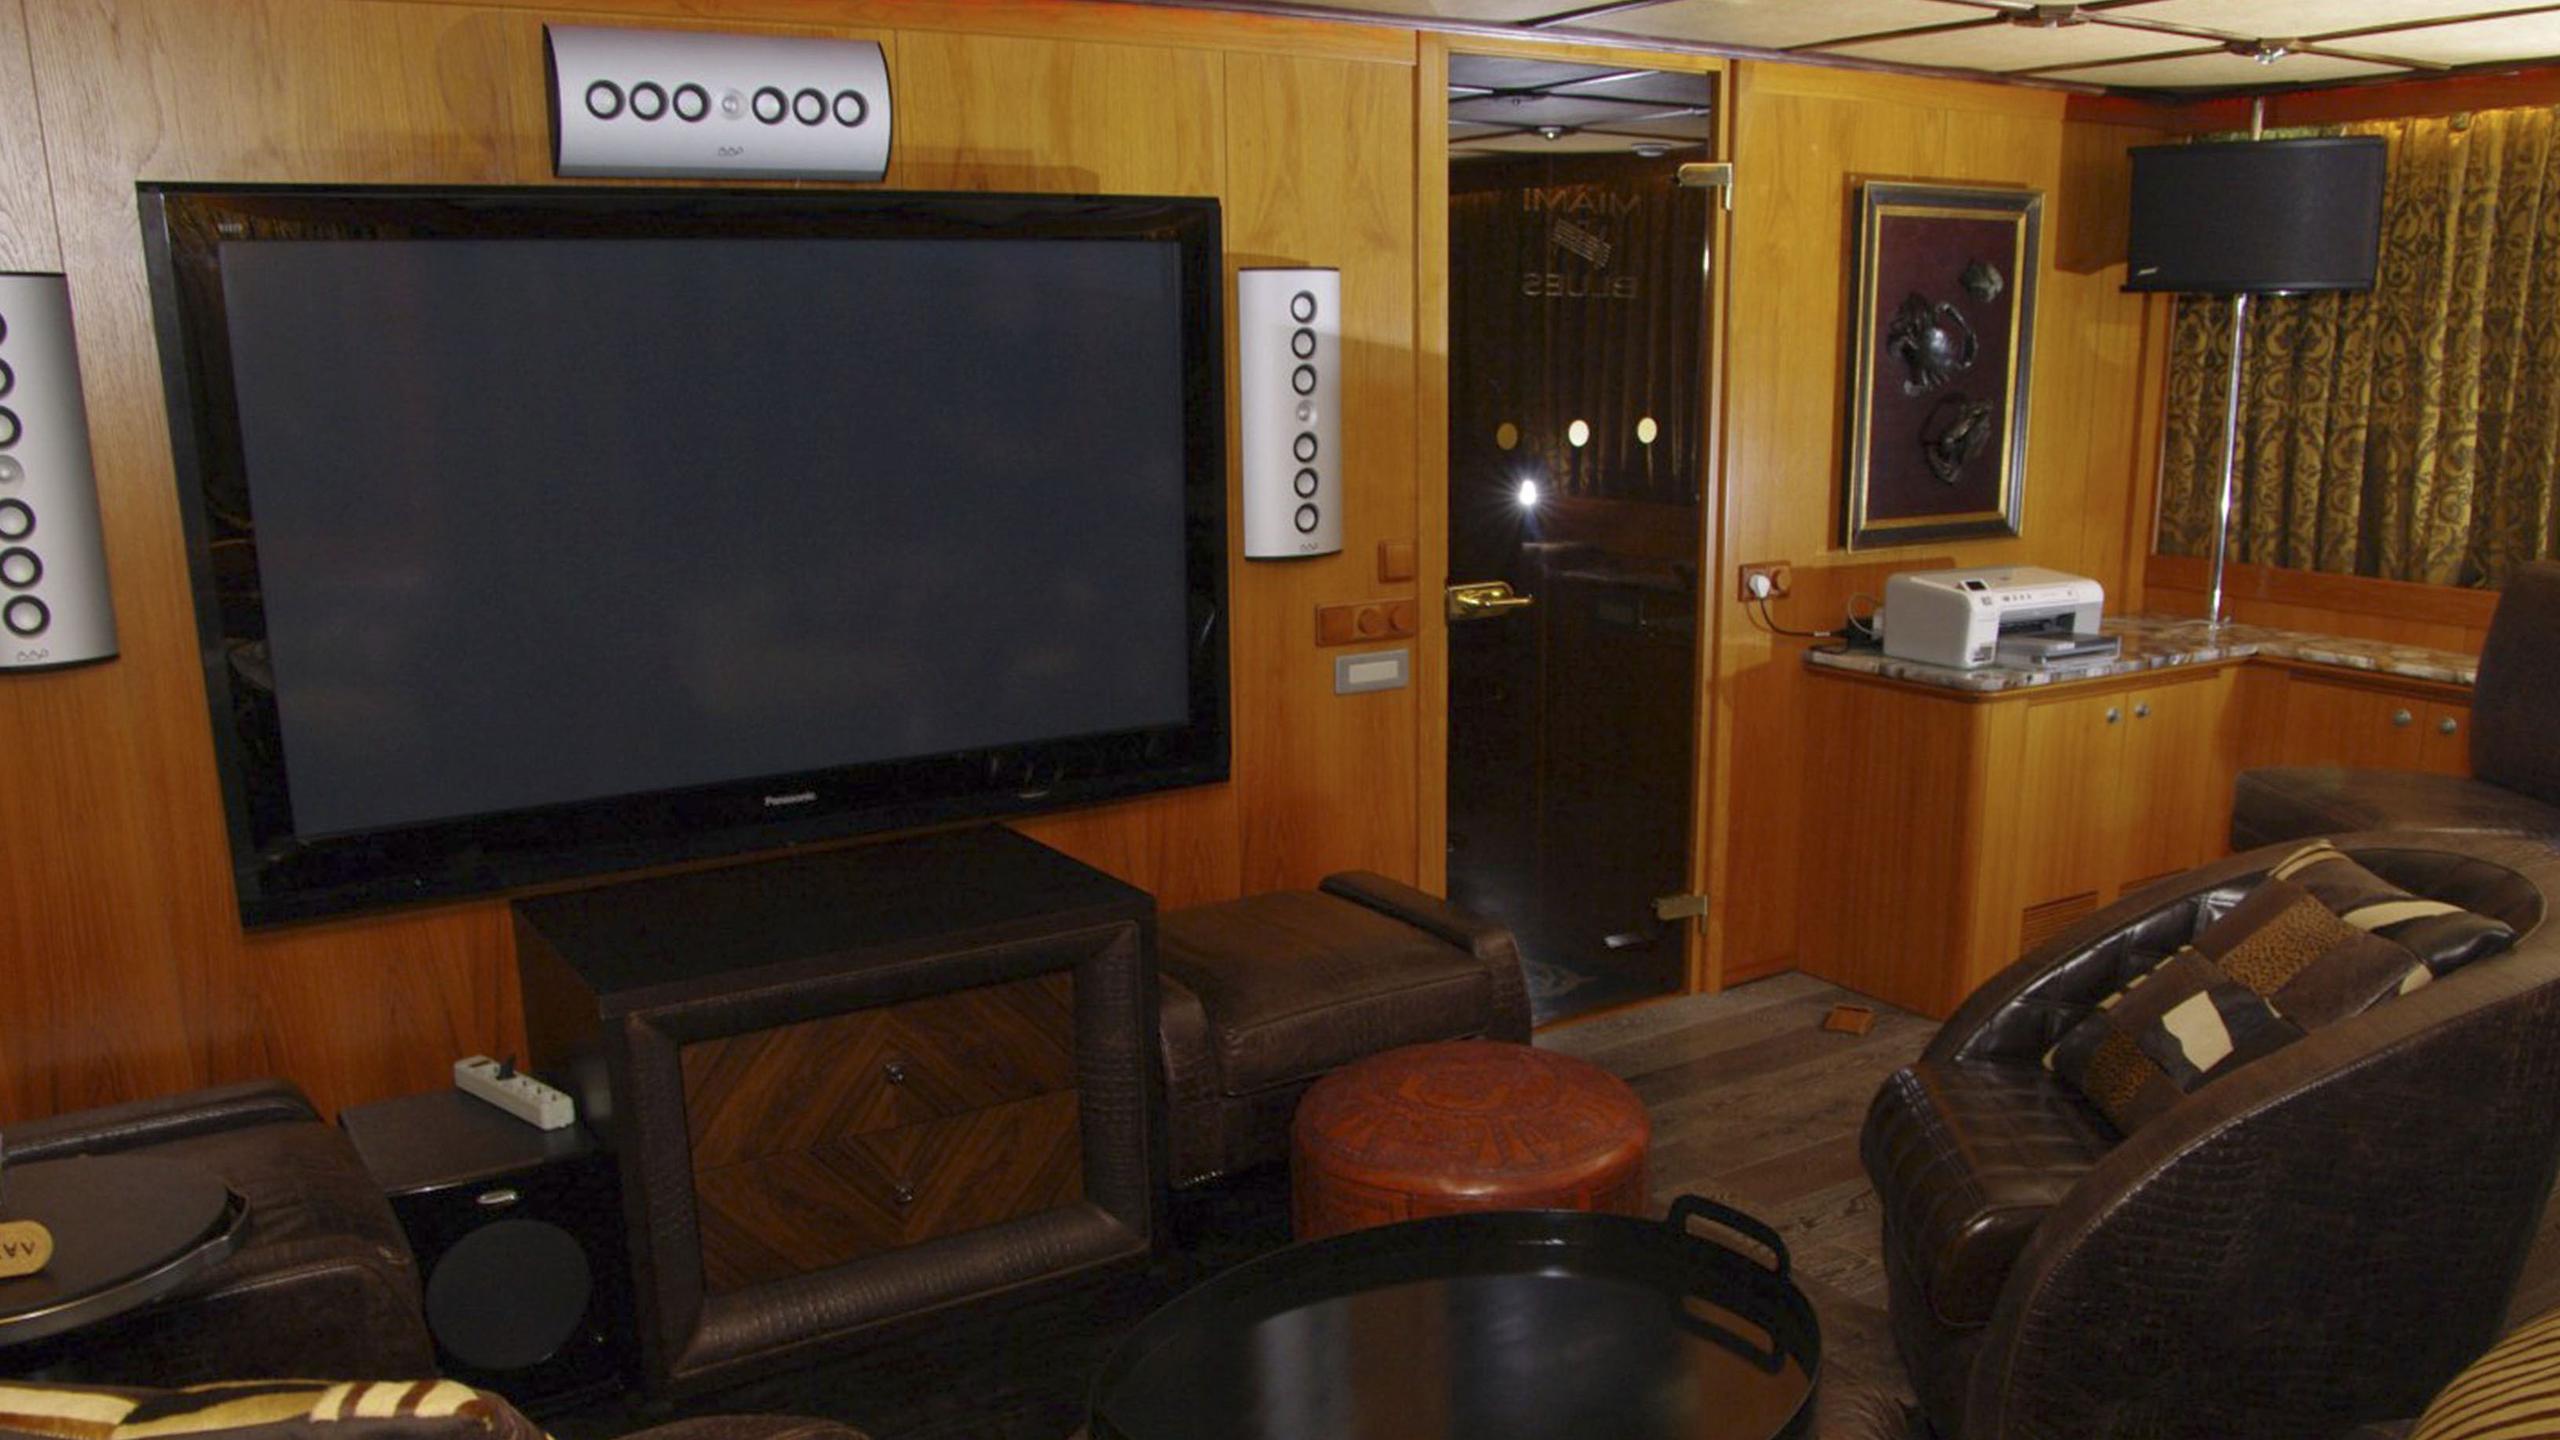 miami-blues-yacht-lounge-tv